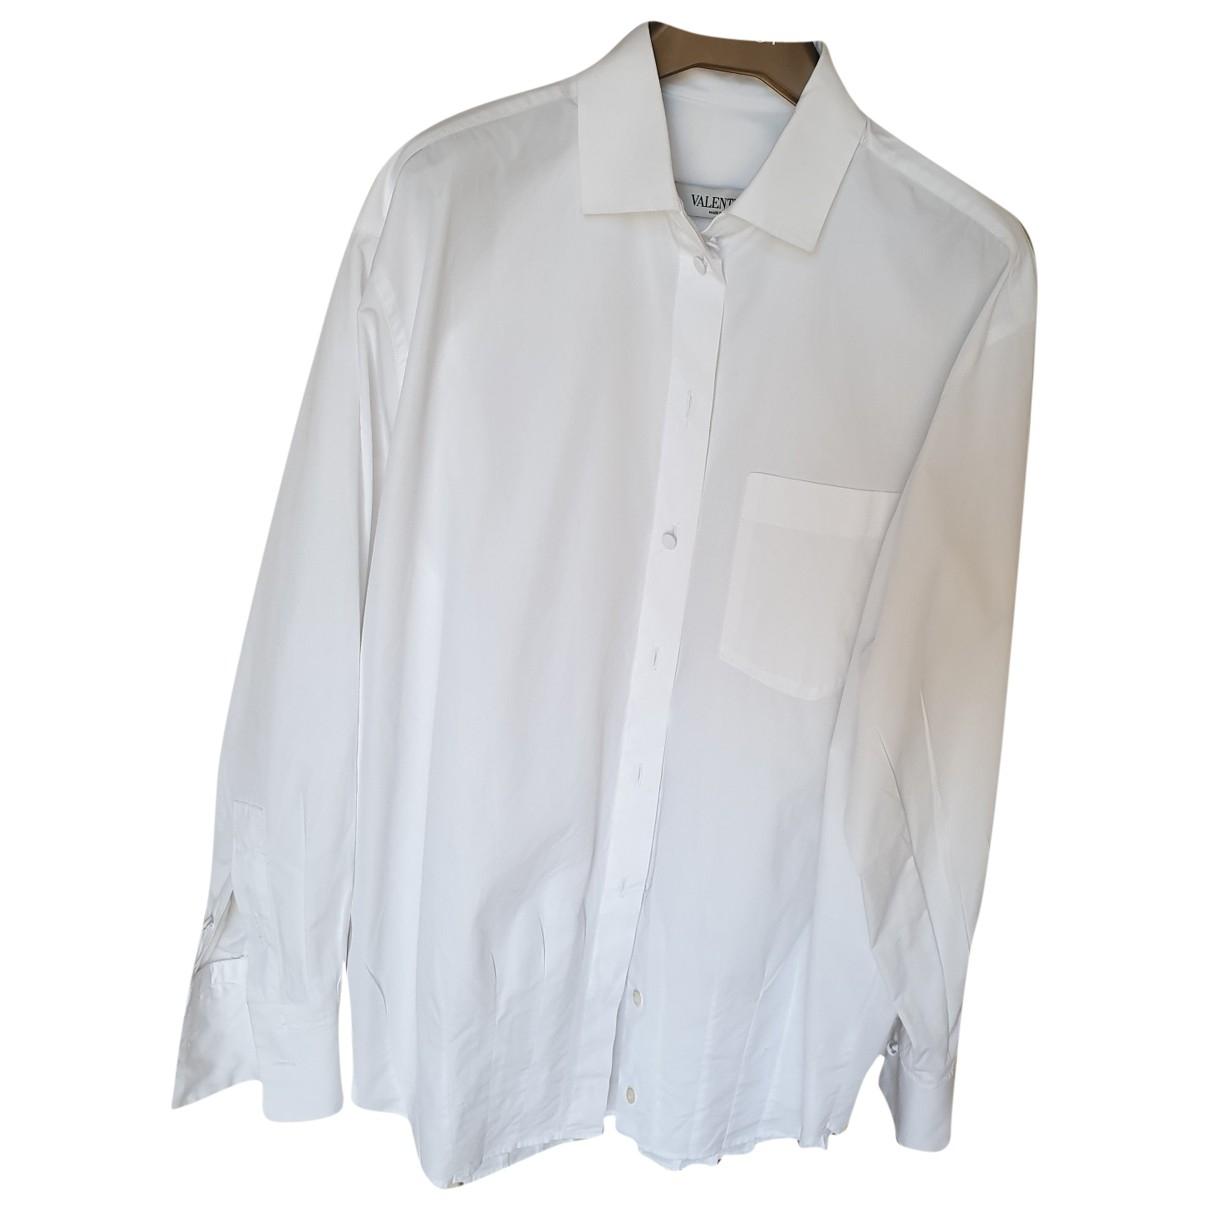 Valentino Garavani \N White Cotton  top for Women 44 IT